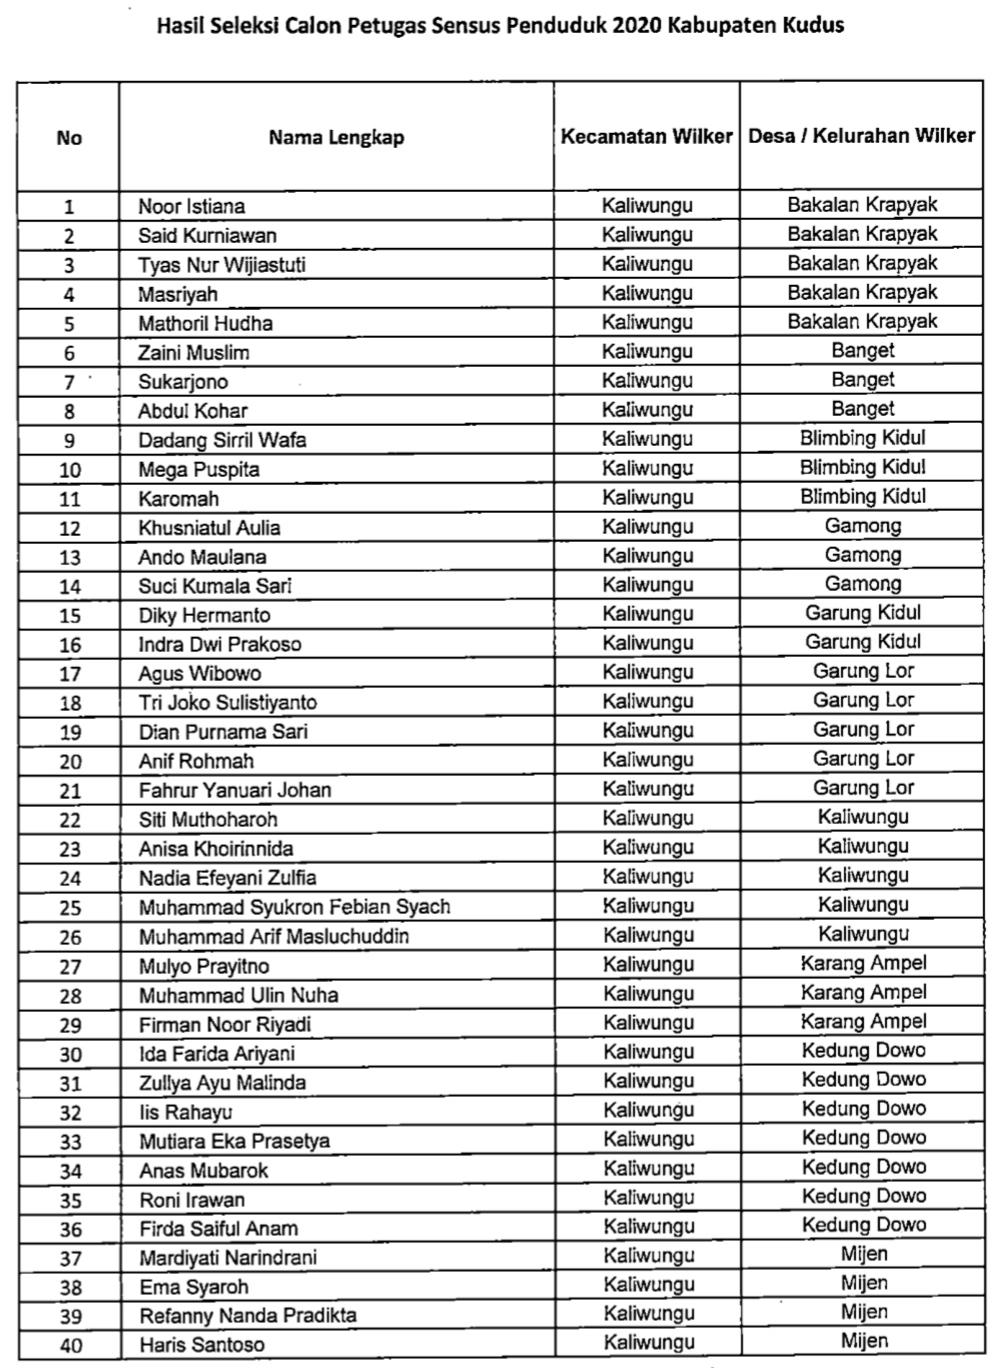 Hasil Seleksi Akhir Calon Petugas Sensus Penduduk 2020, berikut ini kami lampirkan sesuai dari sumber web Badan Pusat Statistik Kabupaten Kudus